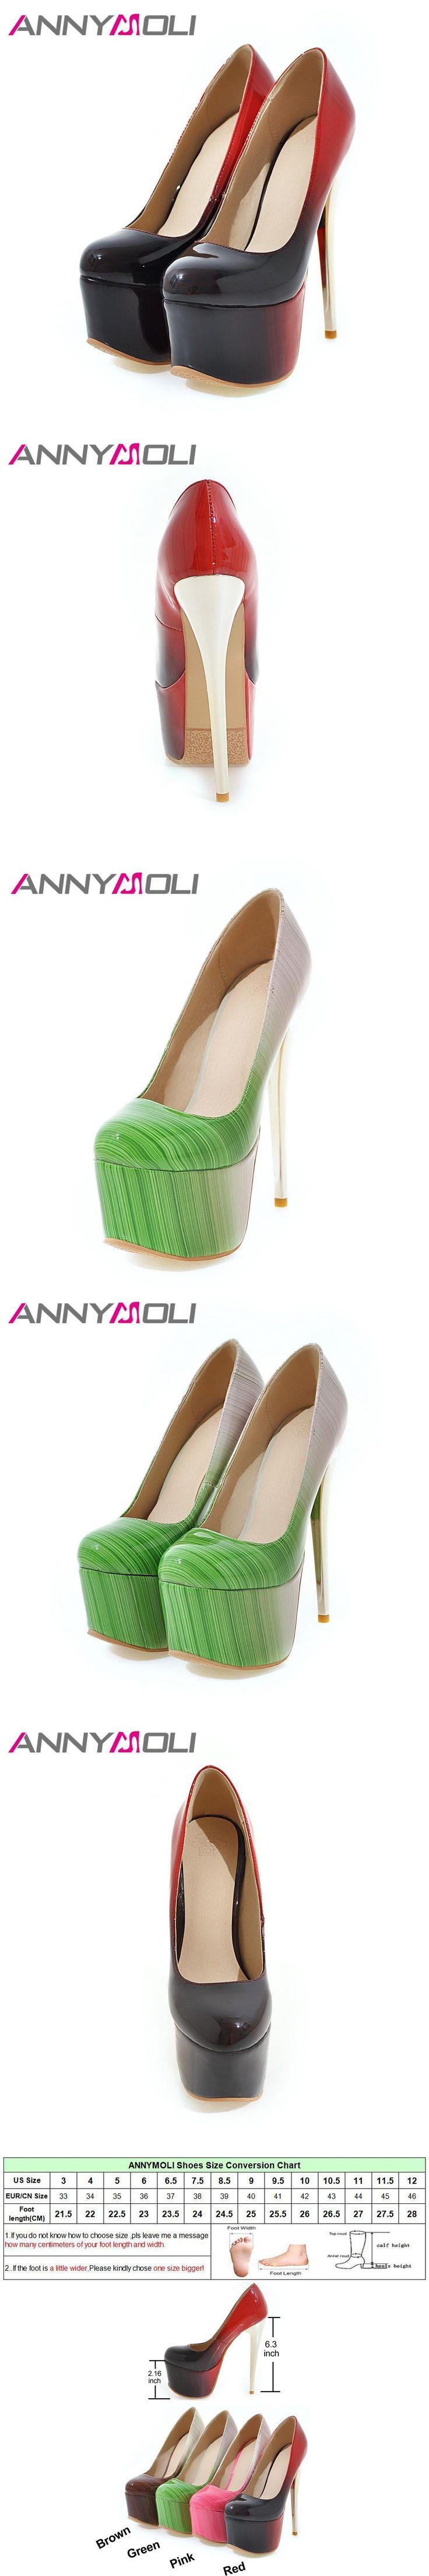 ANNYMOLI Women Pumps Extreme High Heels Platform Women Shoes Shallow Gold Heel Sexy Ladies Shoes Plus Size 33-46 2017 Autumn New